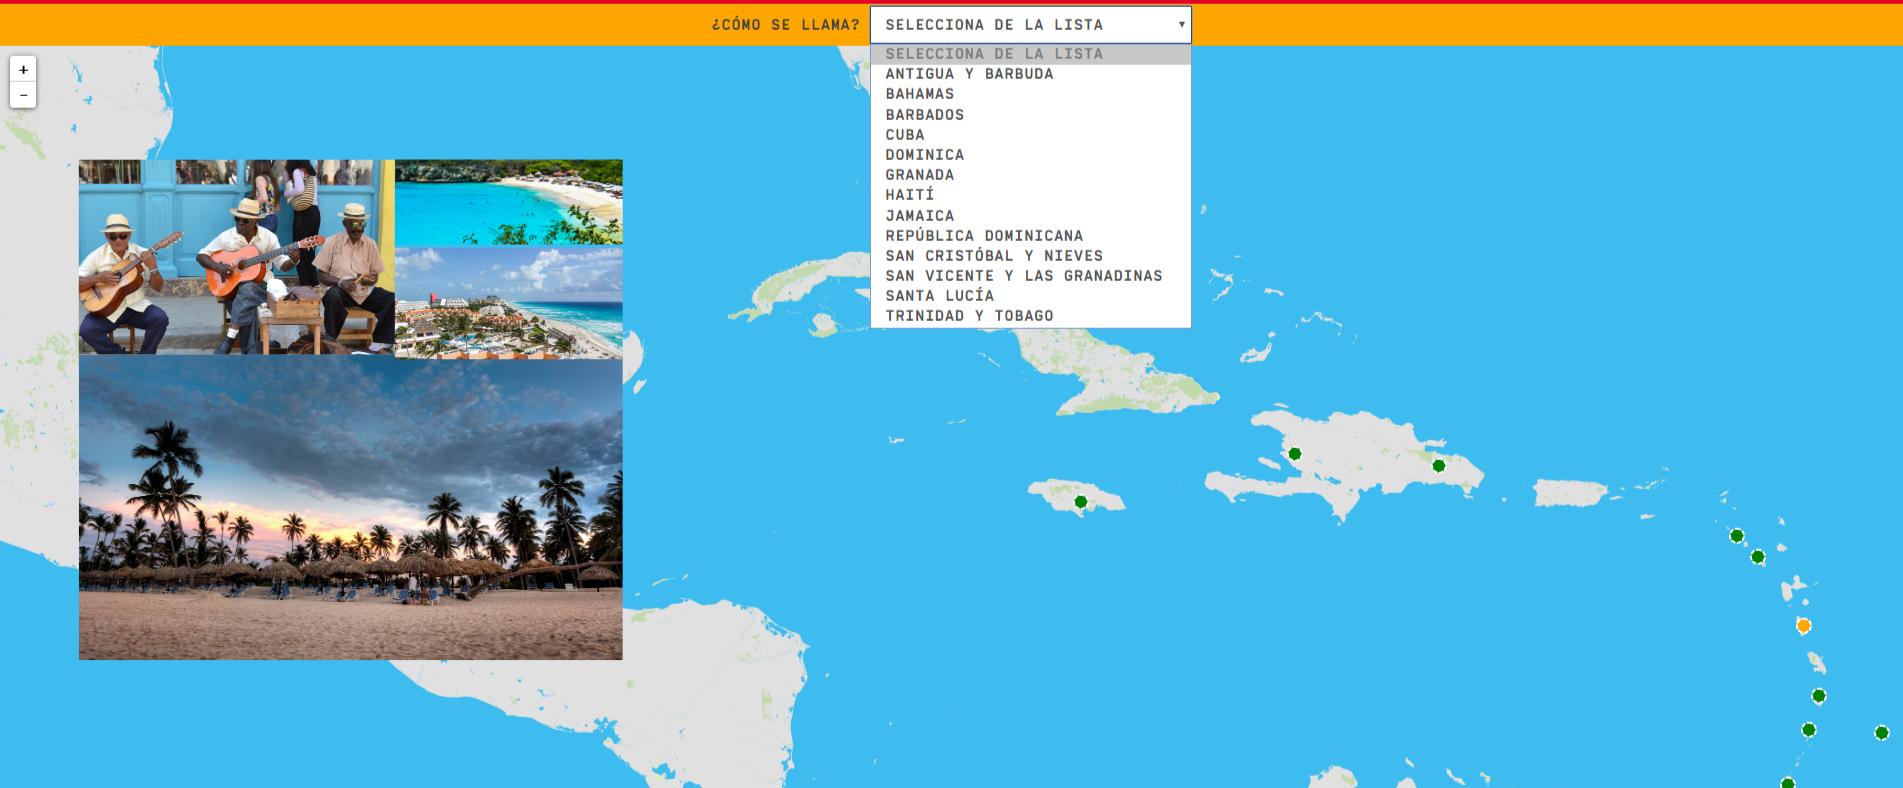 Die Karibik: Länder